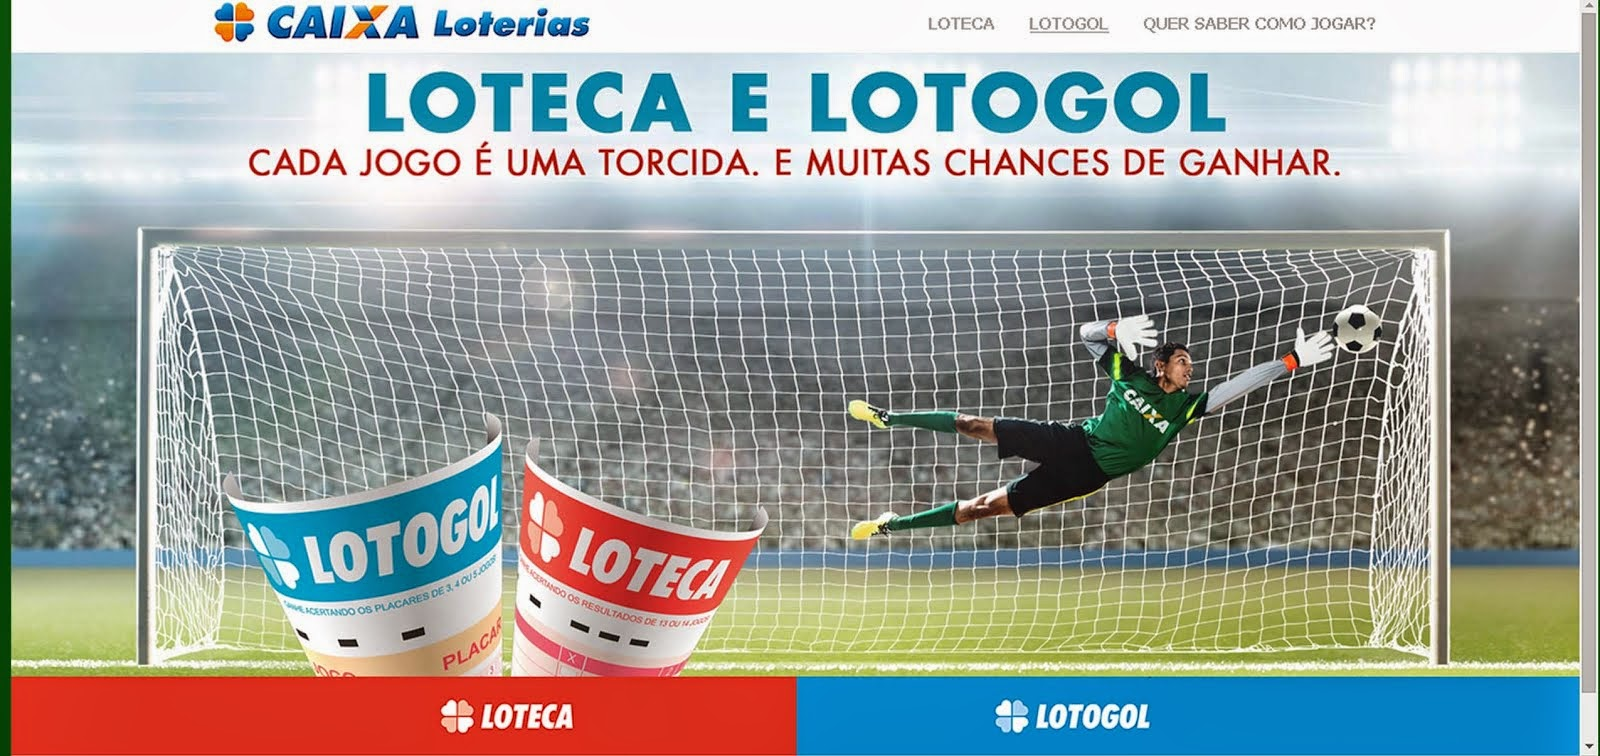 Loteca & lotogol